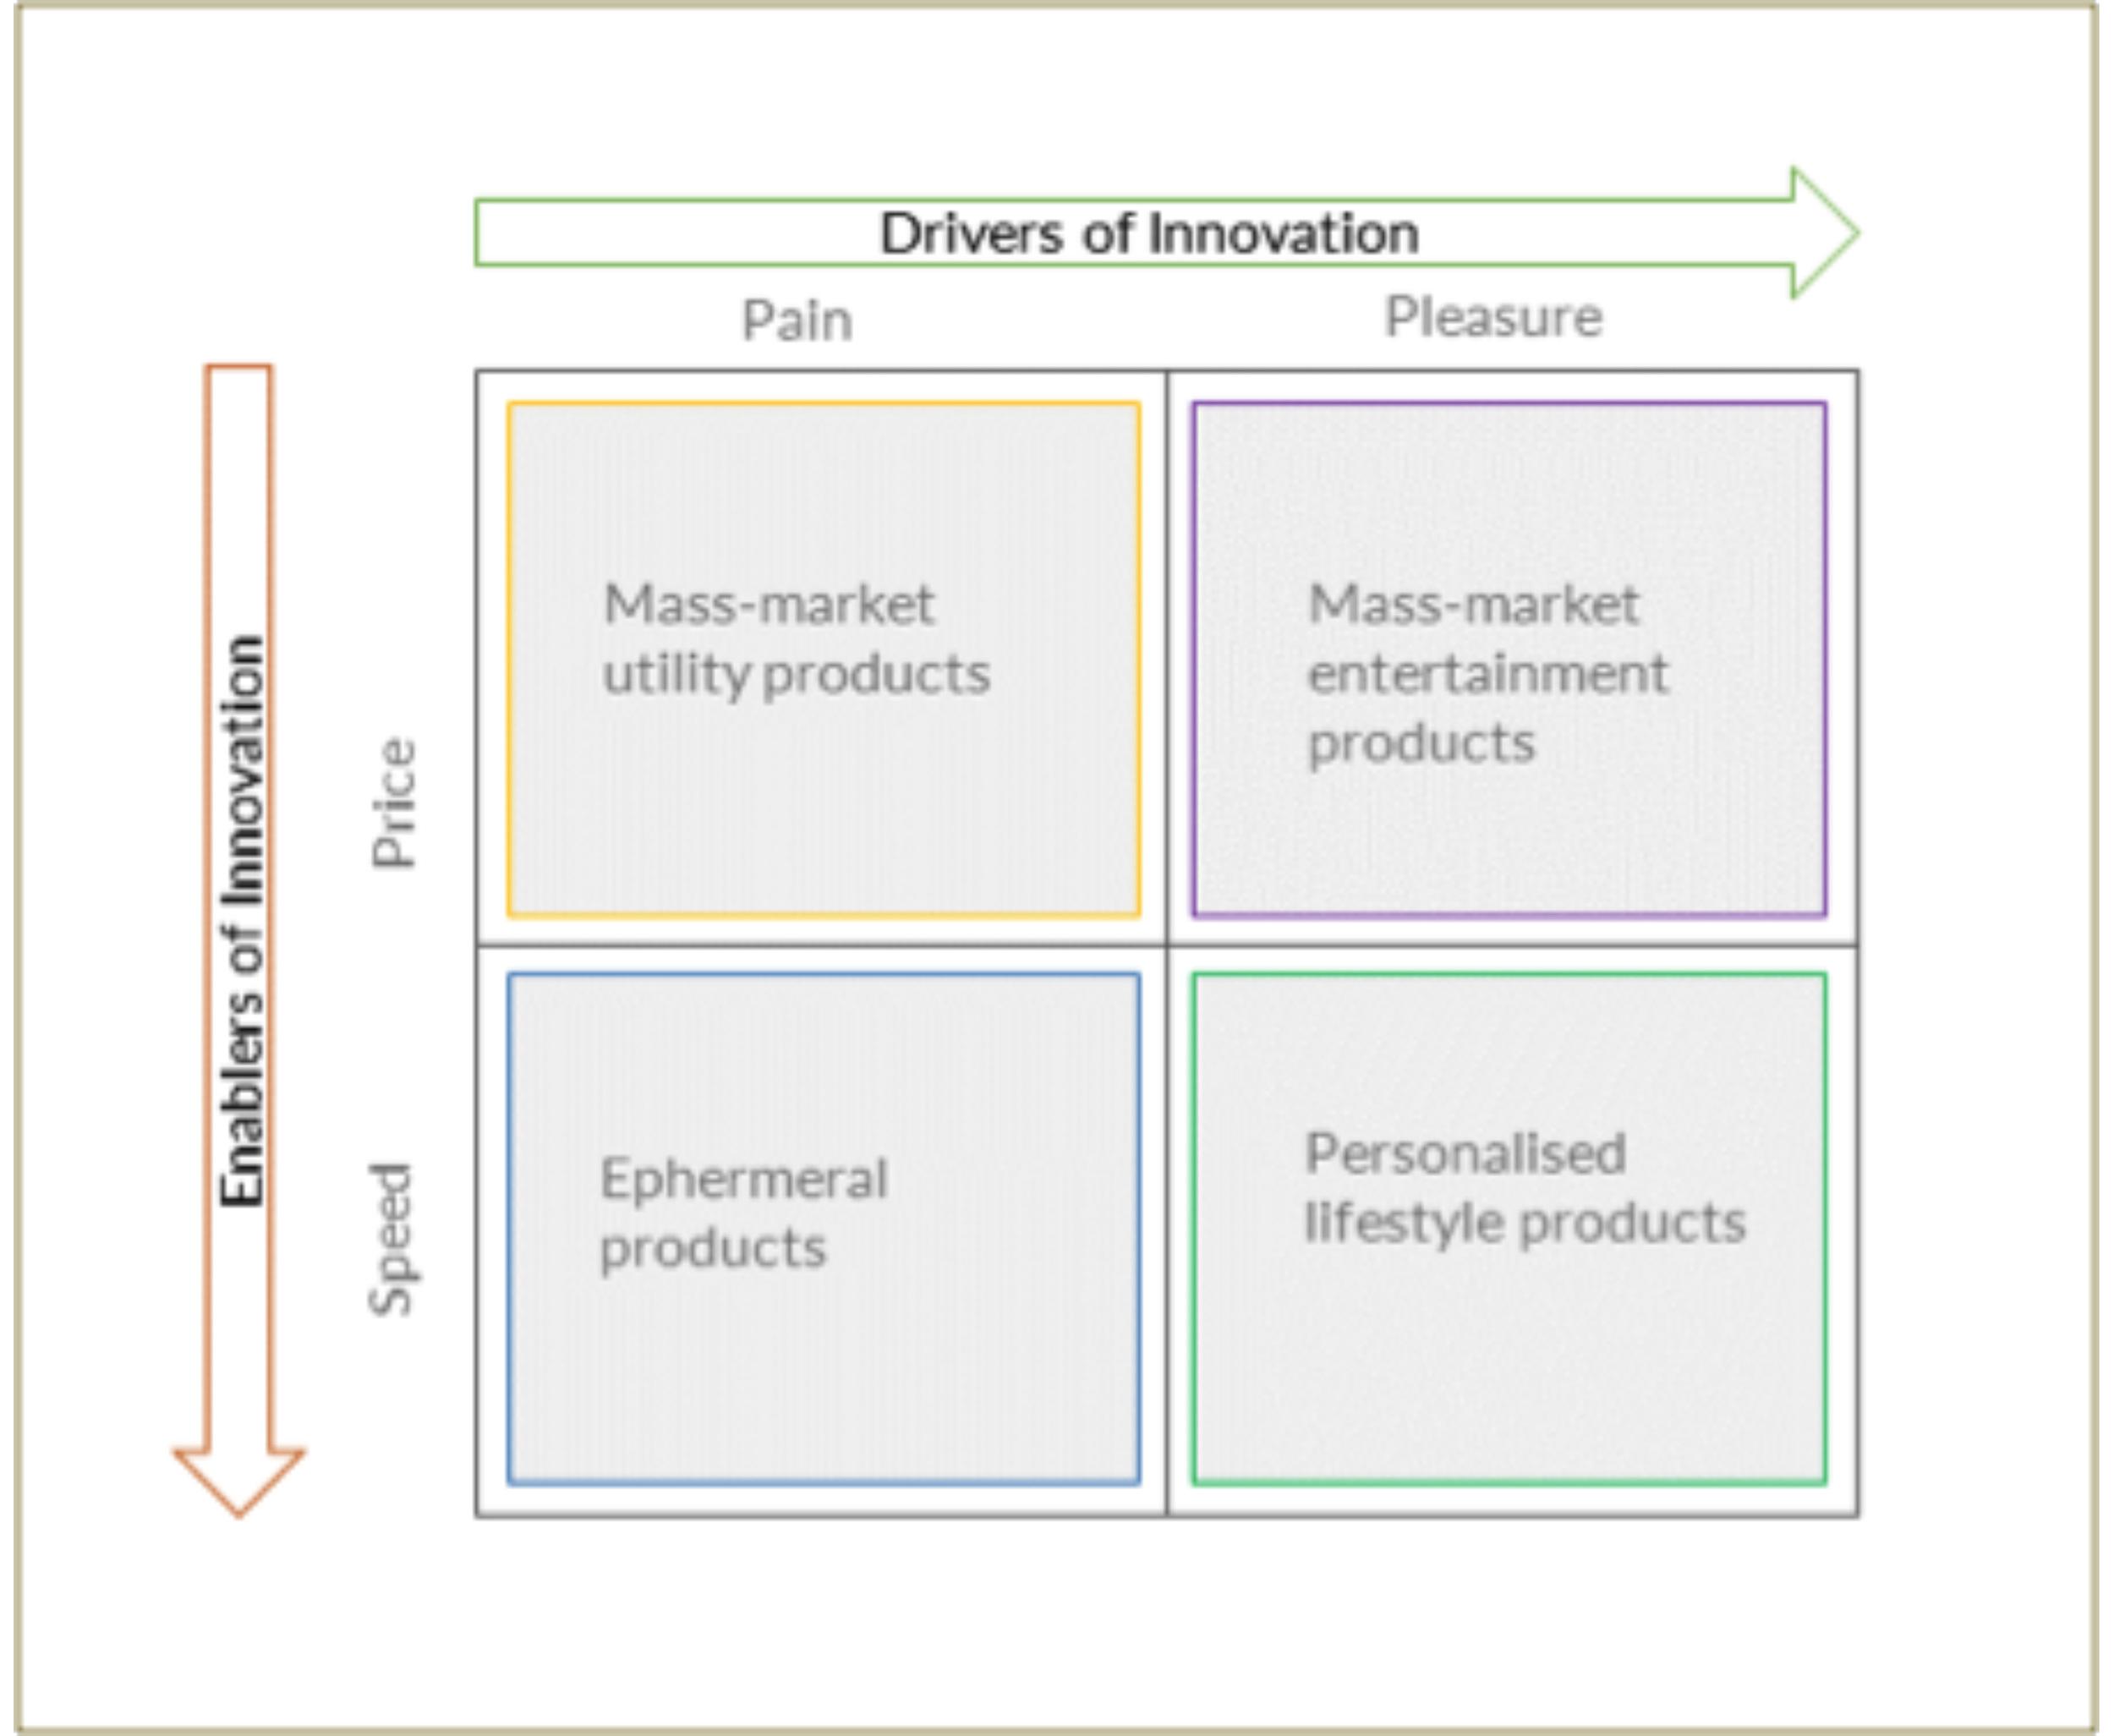 Figure         SEQ Figure \* ARABIC     2      . Drivers-Enabler Innovation Typologies    Source:    Innovation Cube: Triggers, Drivers and Enablers for Successful Innovations, Narasimhalu, A.D., Singapore Management University (2005)